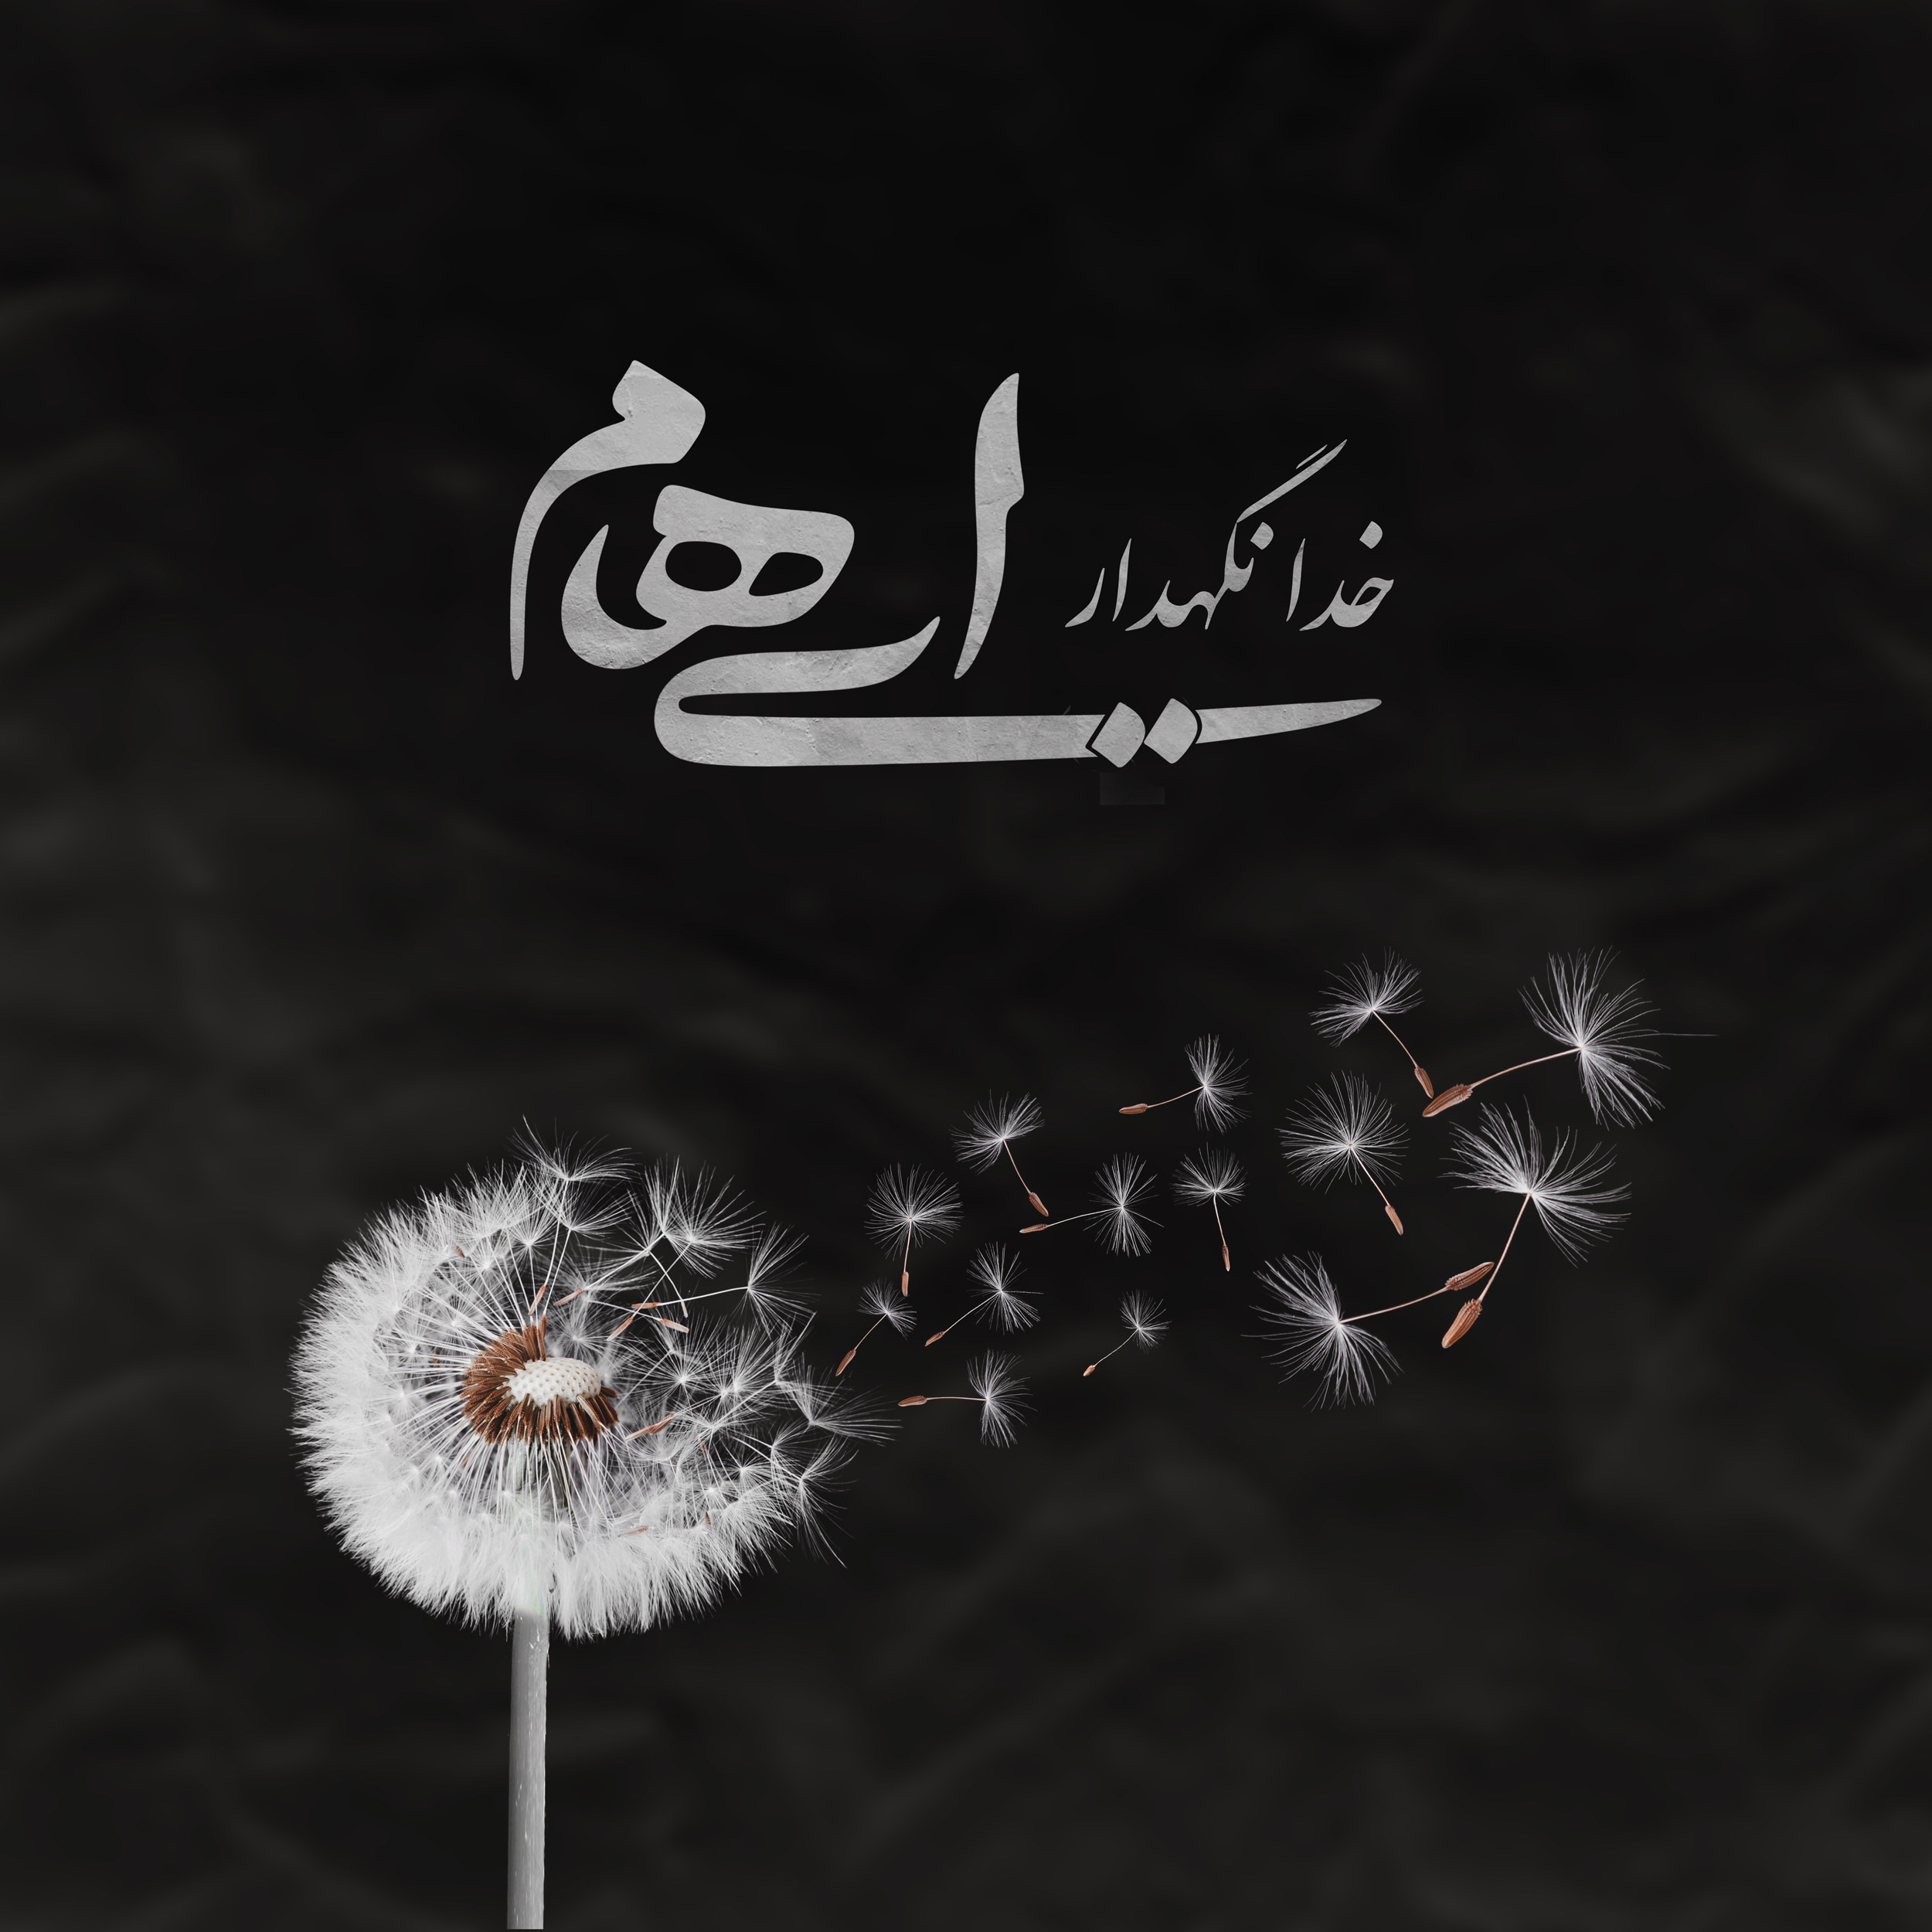 Ehaam – Khoda Negahdar